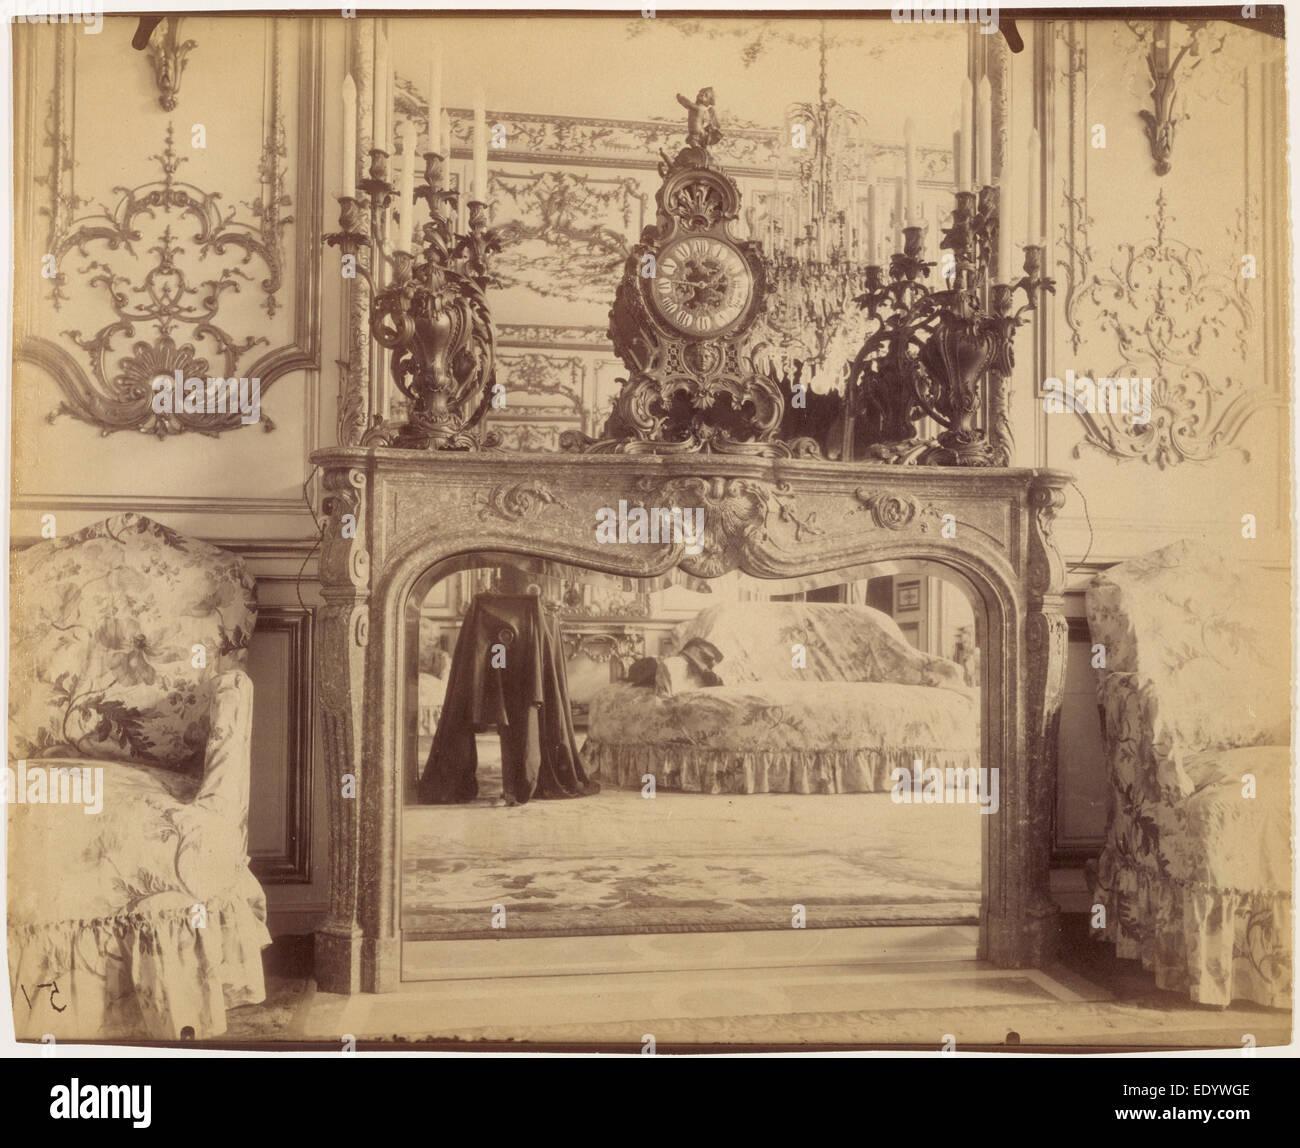 The Austrian Embassy, 57 rue de Varenne; Eugène Atget, French, 1857 - 1927; Paris, France, Europe; 1905; Albumen - Stock Image